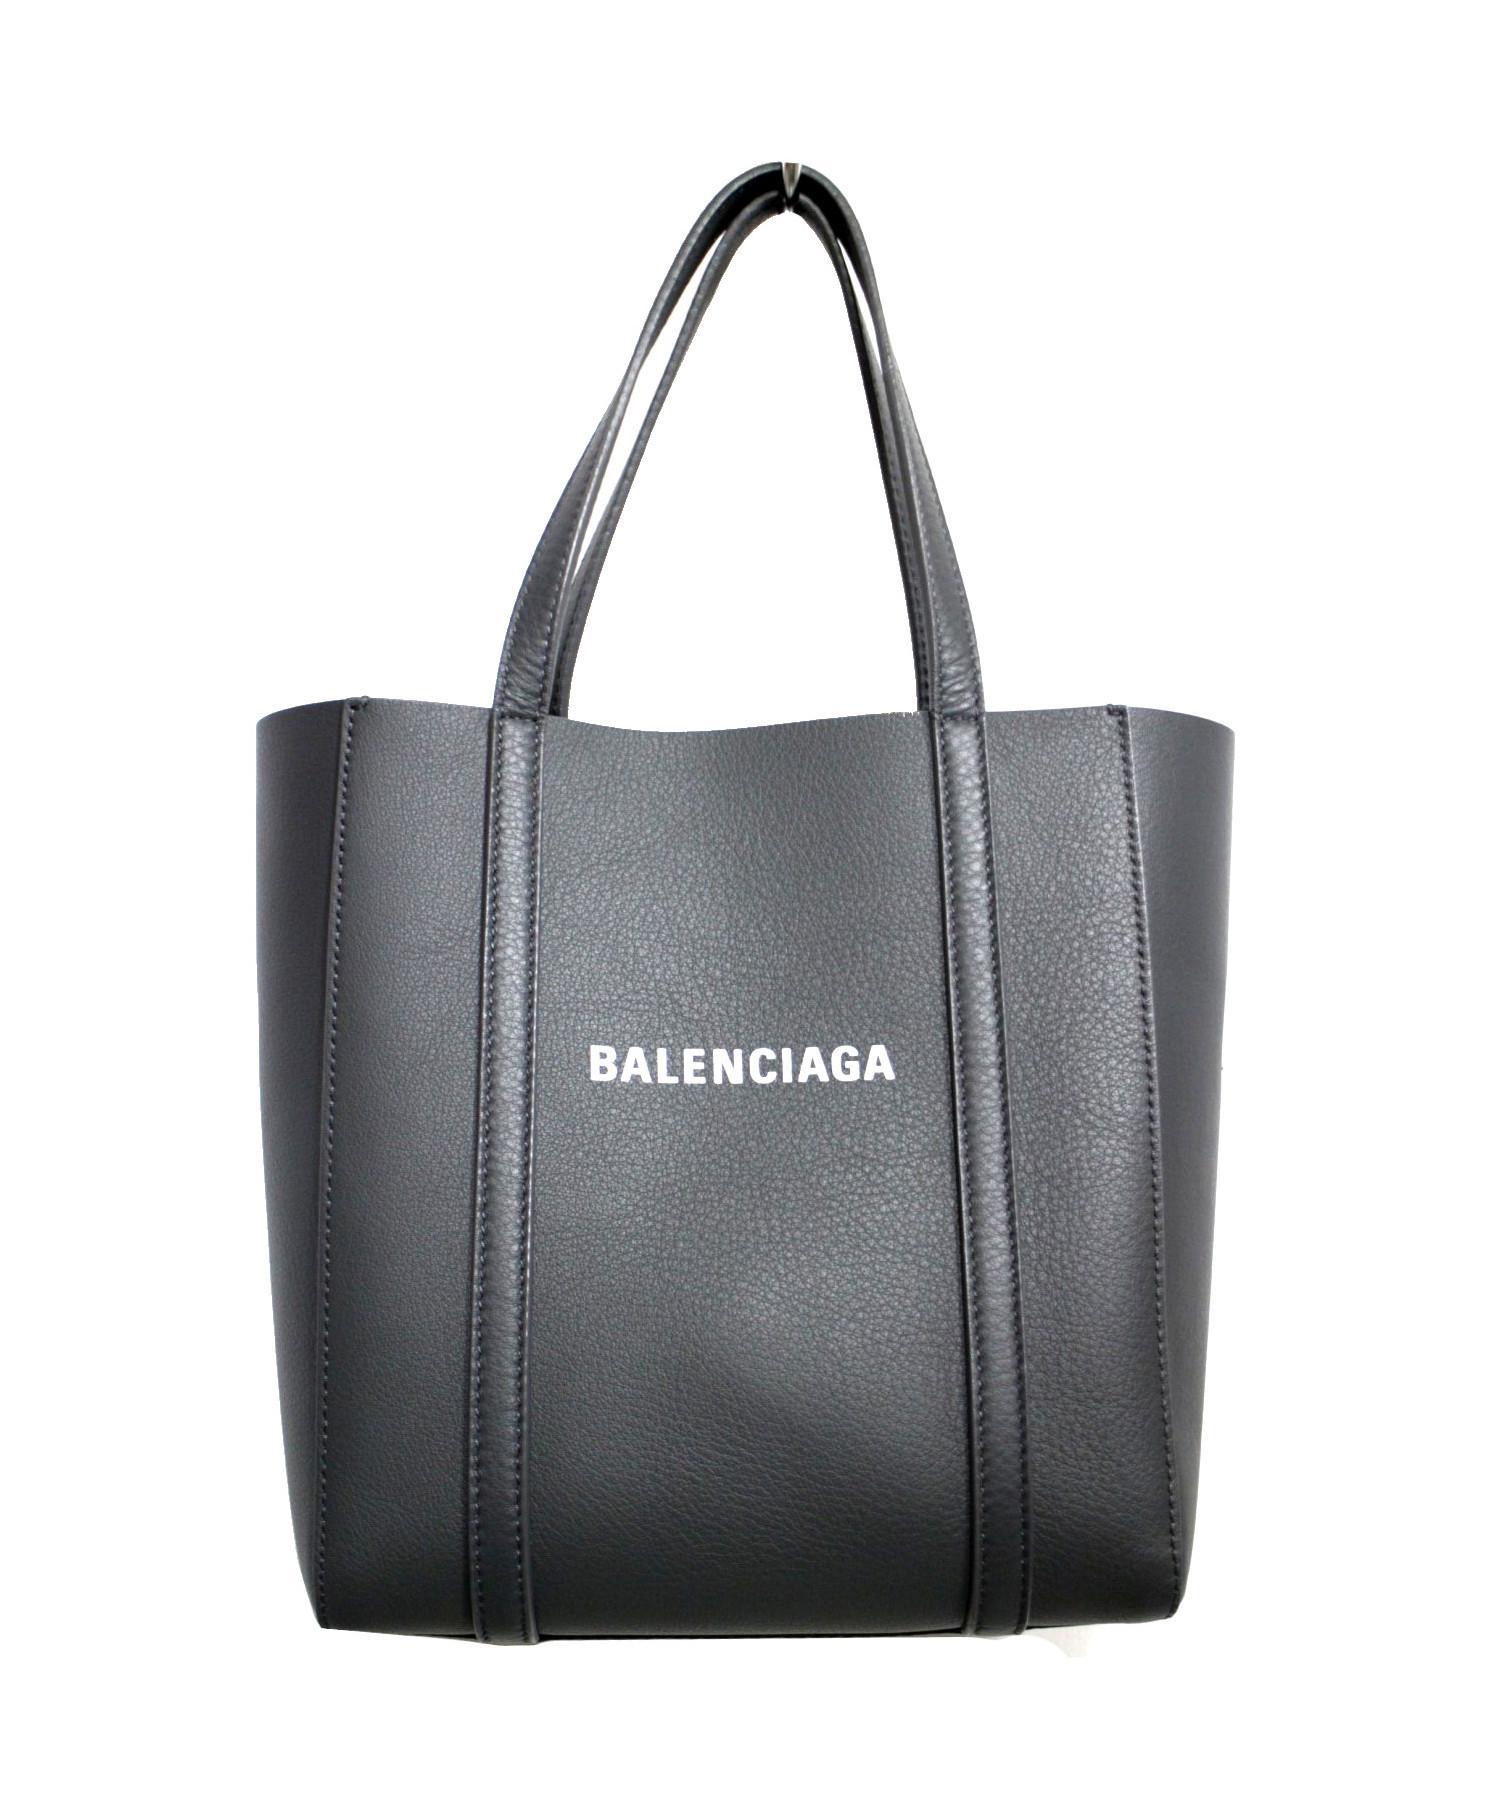 best website 1df80 3fd27 [中古]BALENCIAGA(バレンシアガ)のレディース バッグ エブリデイトートXXS バッグ